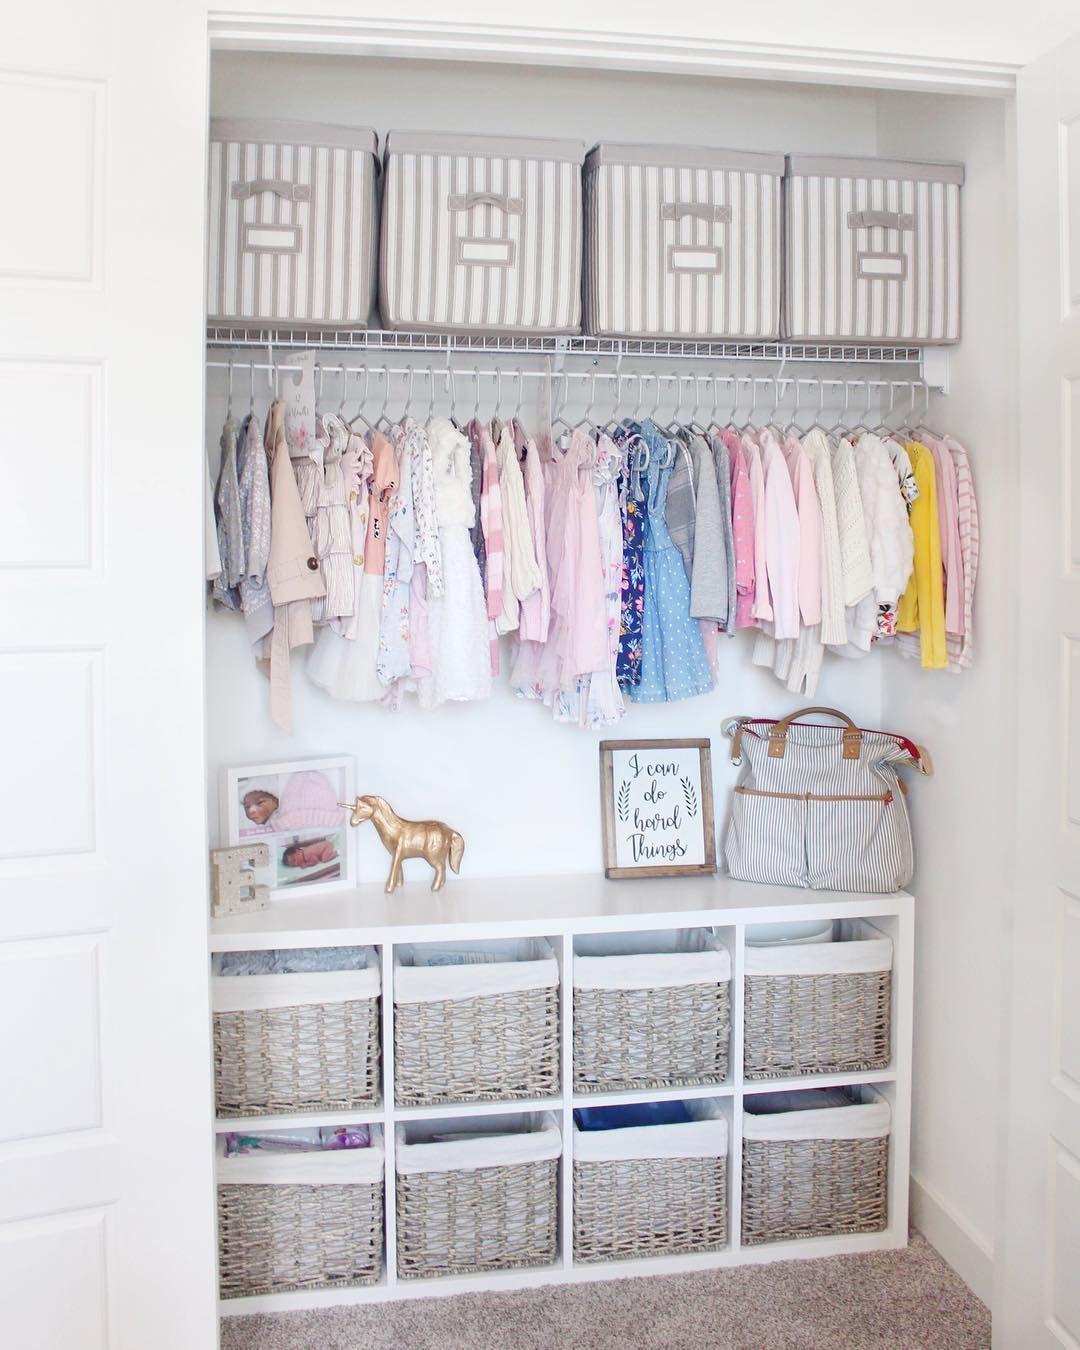 8 Stylish Children S Wardrobe And Closet Ideas Idees De Placard Rangement Chambre Bebe Et Idee Rangement Chambre